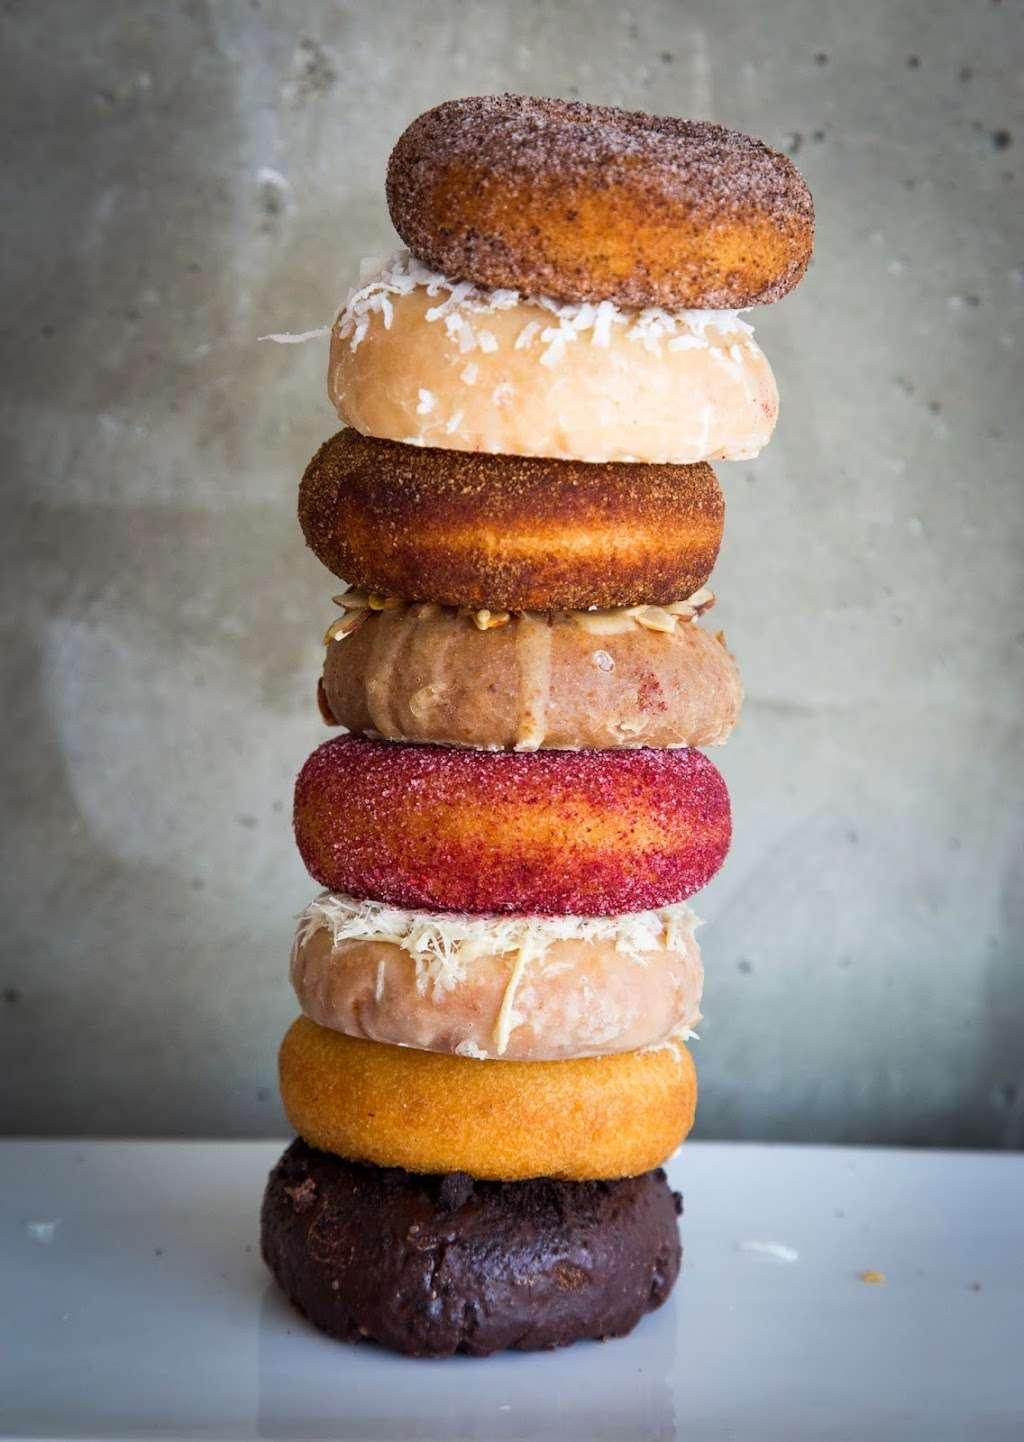 Underwest Donuts - bakery    Photo 8 of 10   Address: 638 W 47th St, New York, NY 10036, USA   Phone: (212) 317-2359